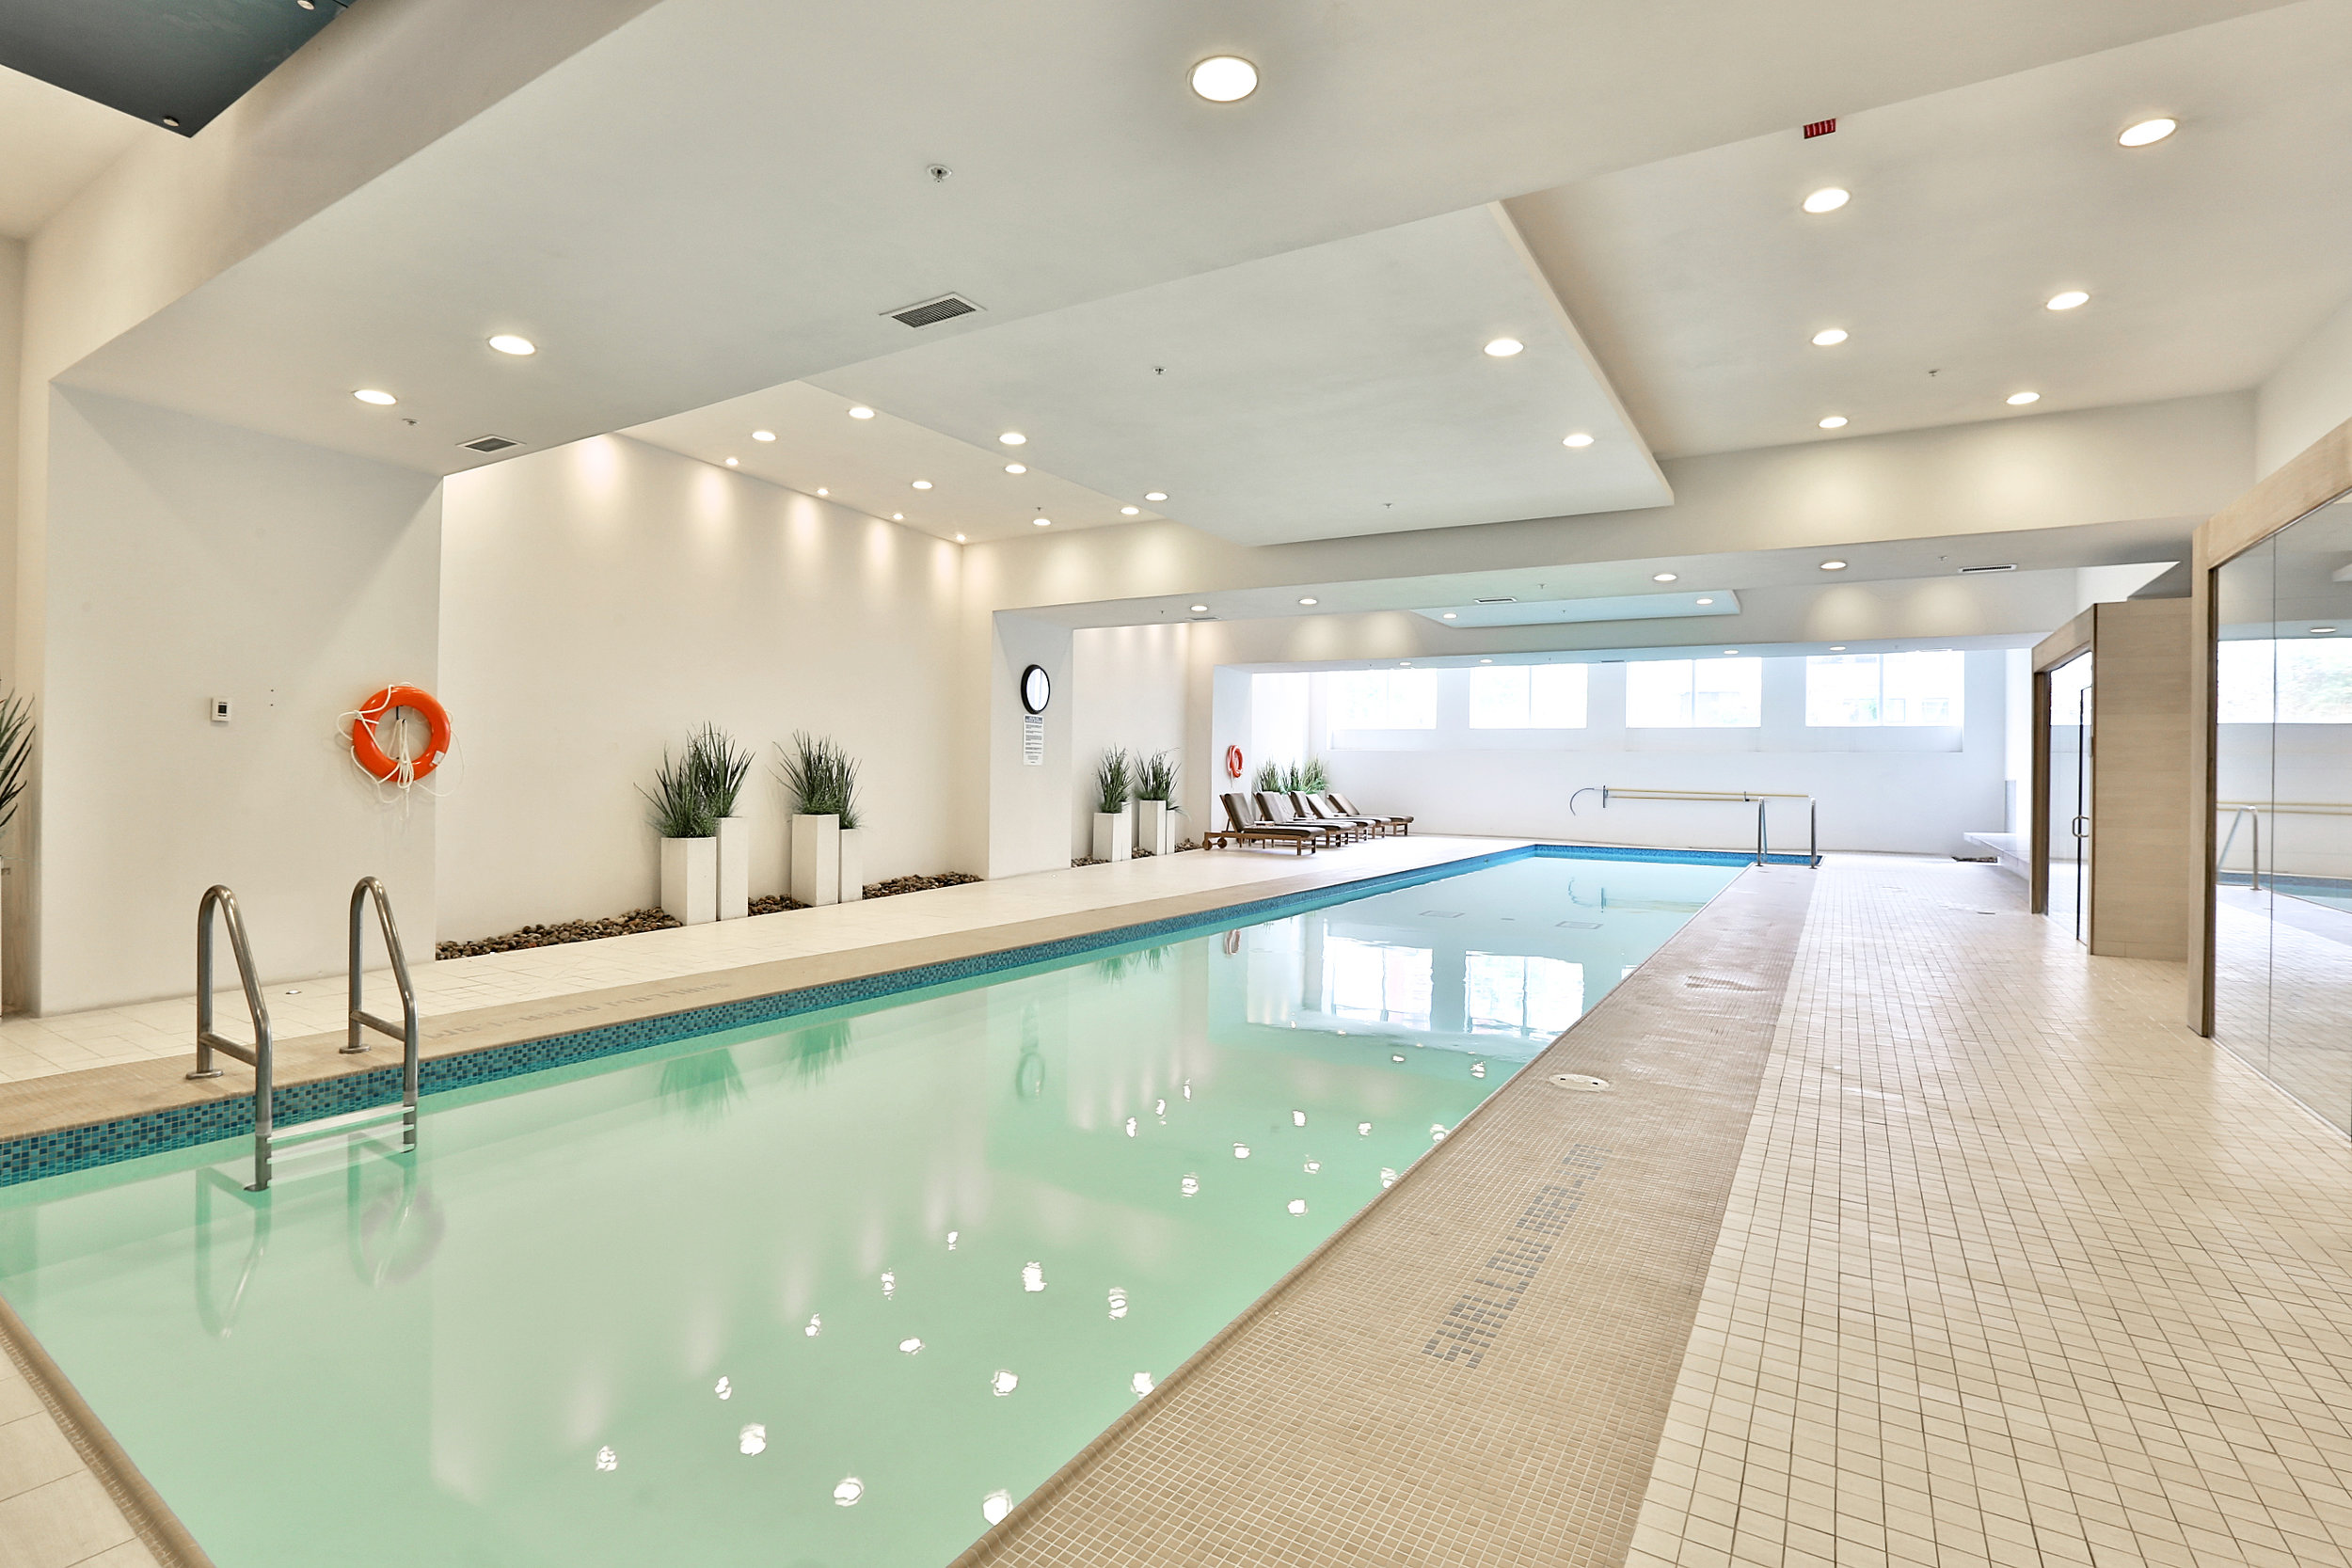 2191 Yonge Street Pool Slavens Real Estate Toronto.jpg